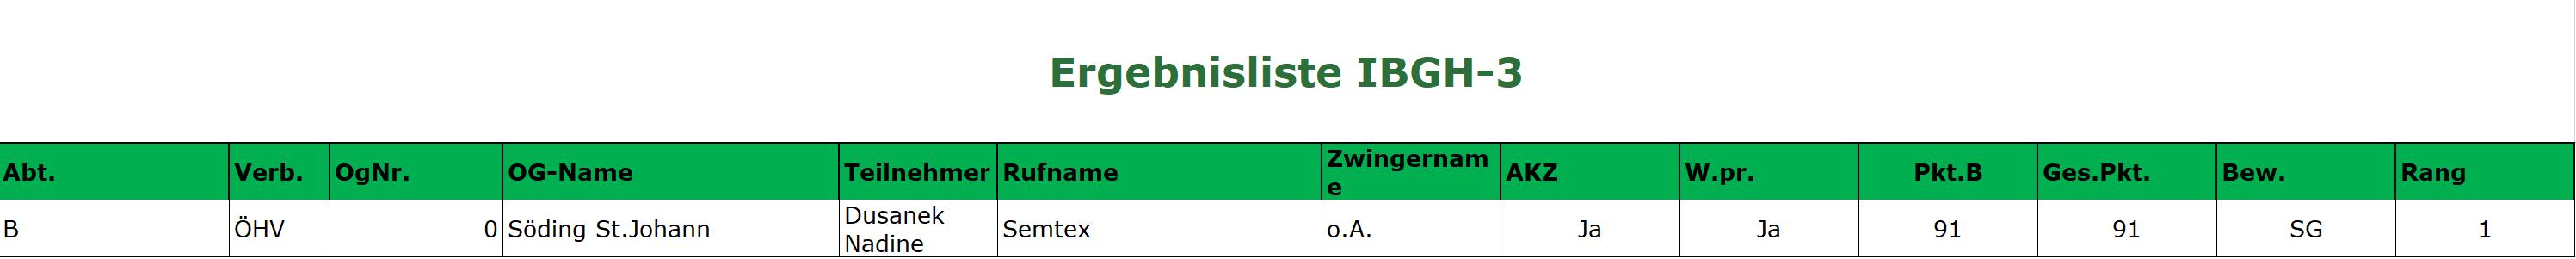 2019-11-27_Herbstprüfung 2019_IBGH3